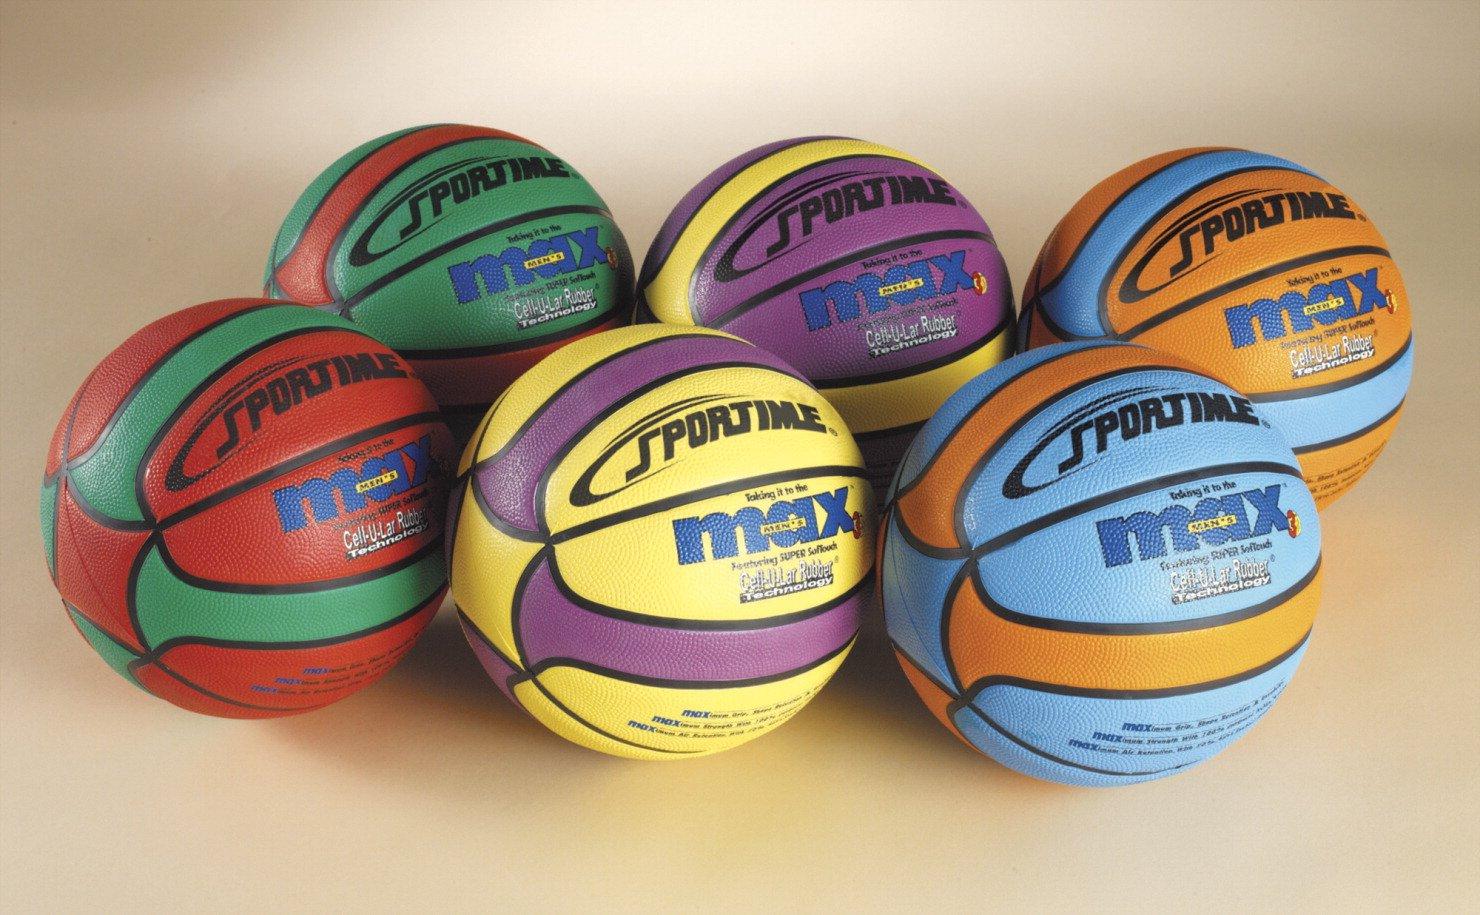 SportimeMax Junior 27-1 2 in Star Basketballs, Set of 6